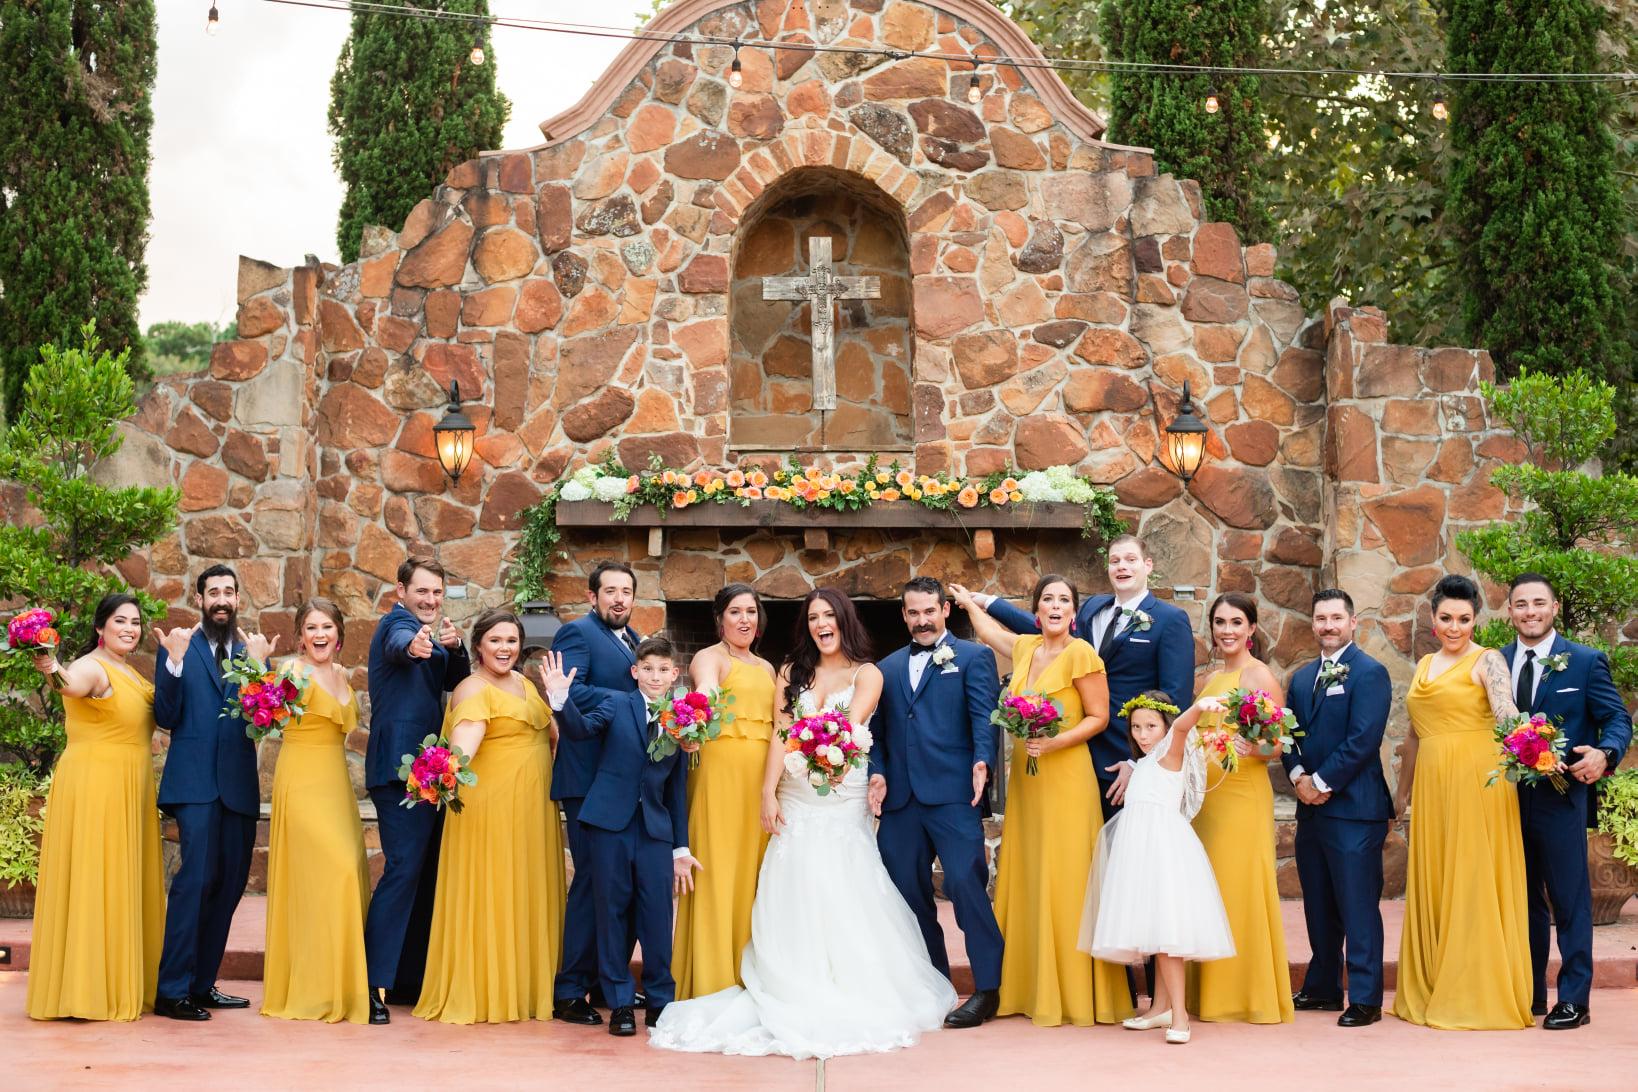 Yellow Bridesmaids Dresses Madera Estates in Conroe, Texas